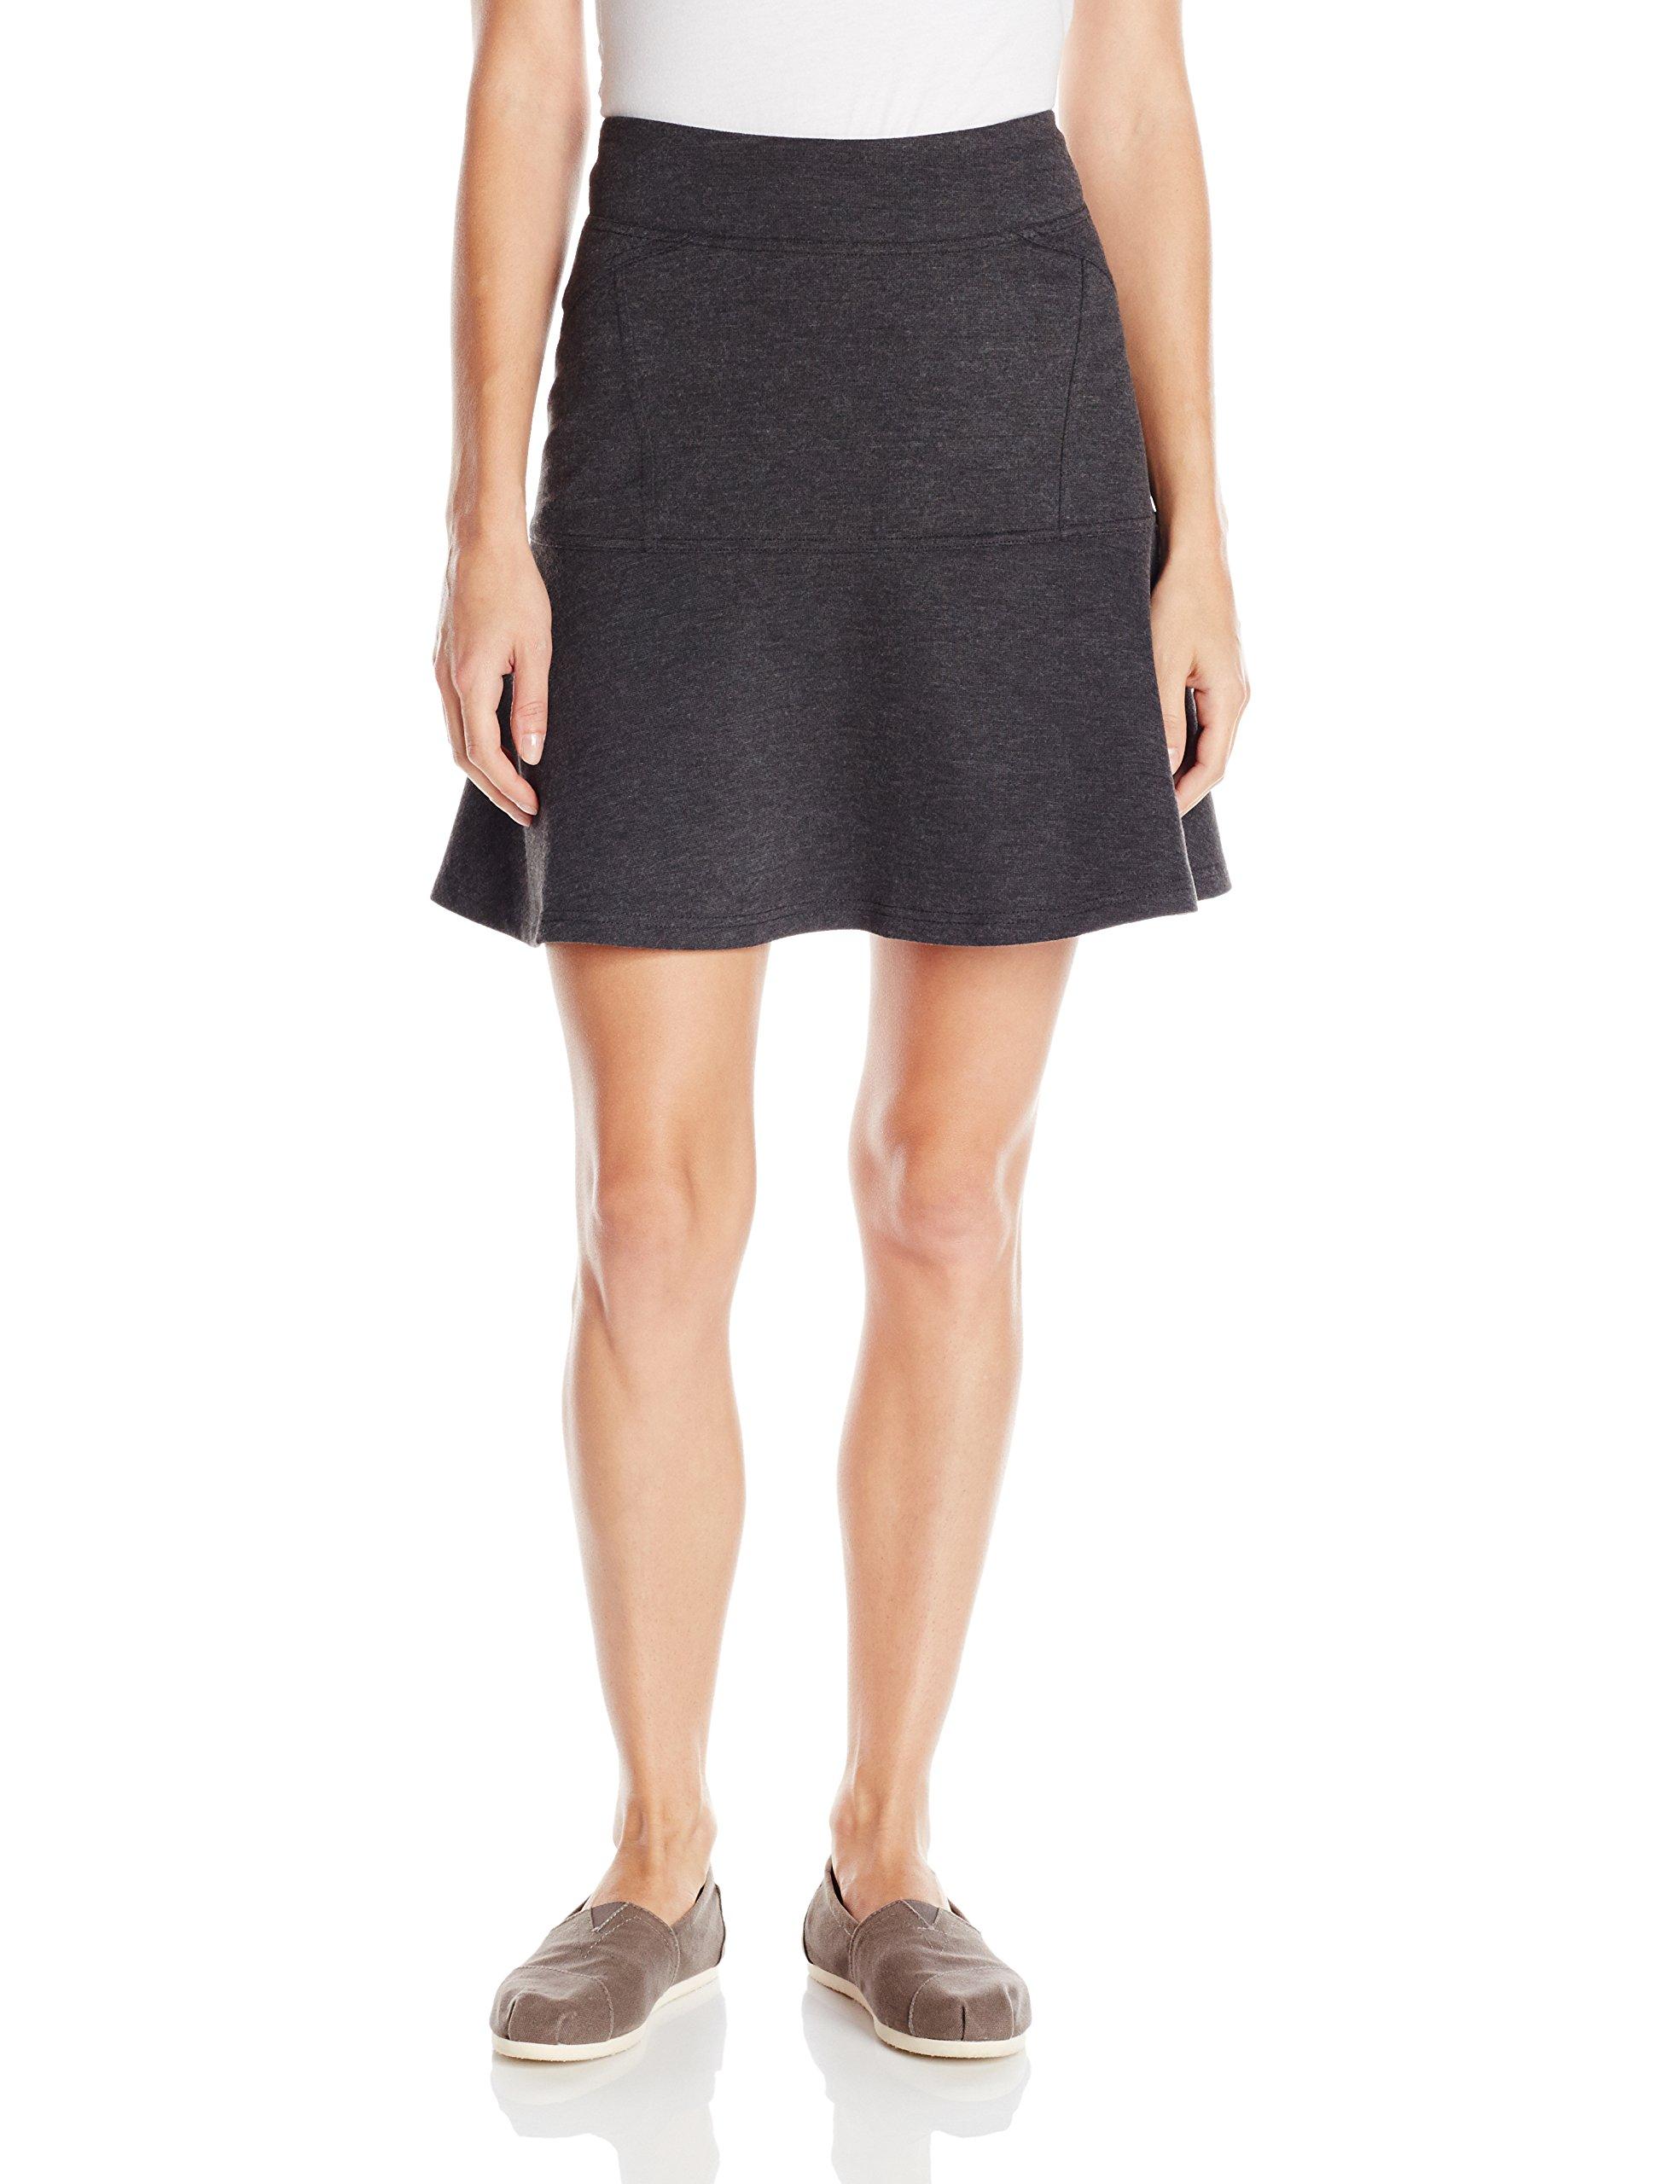 prAna Women's Gianna Skirt, X-Small, Charcoal by prAna